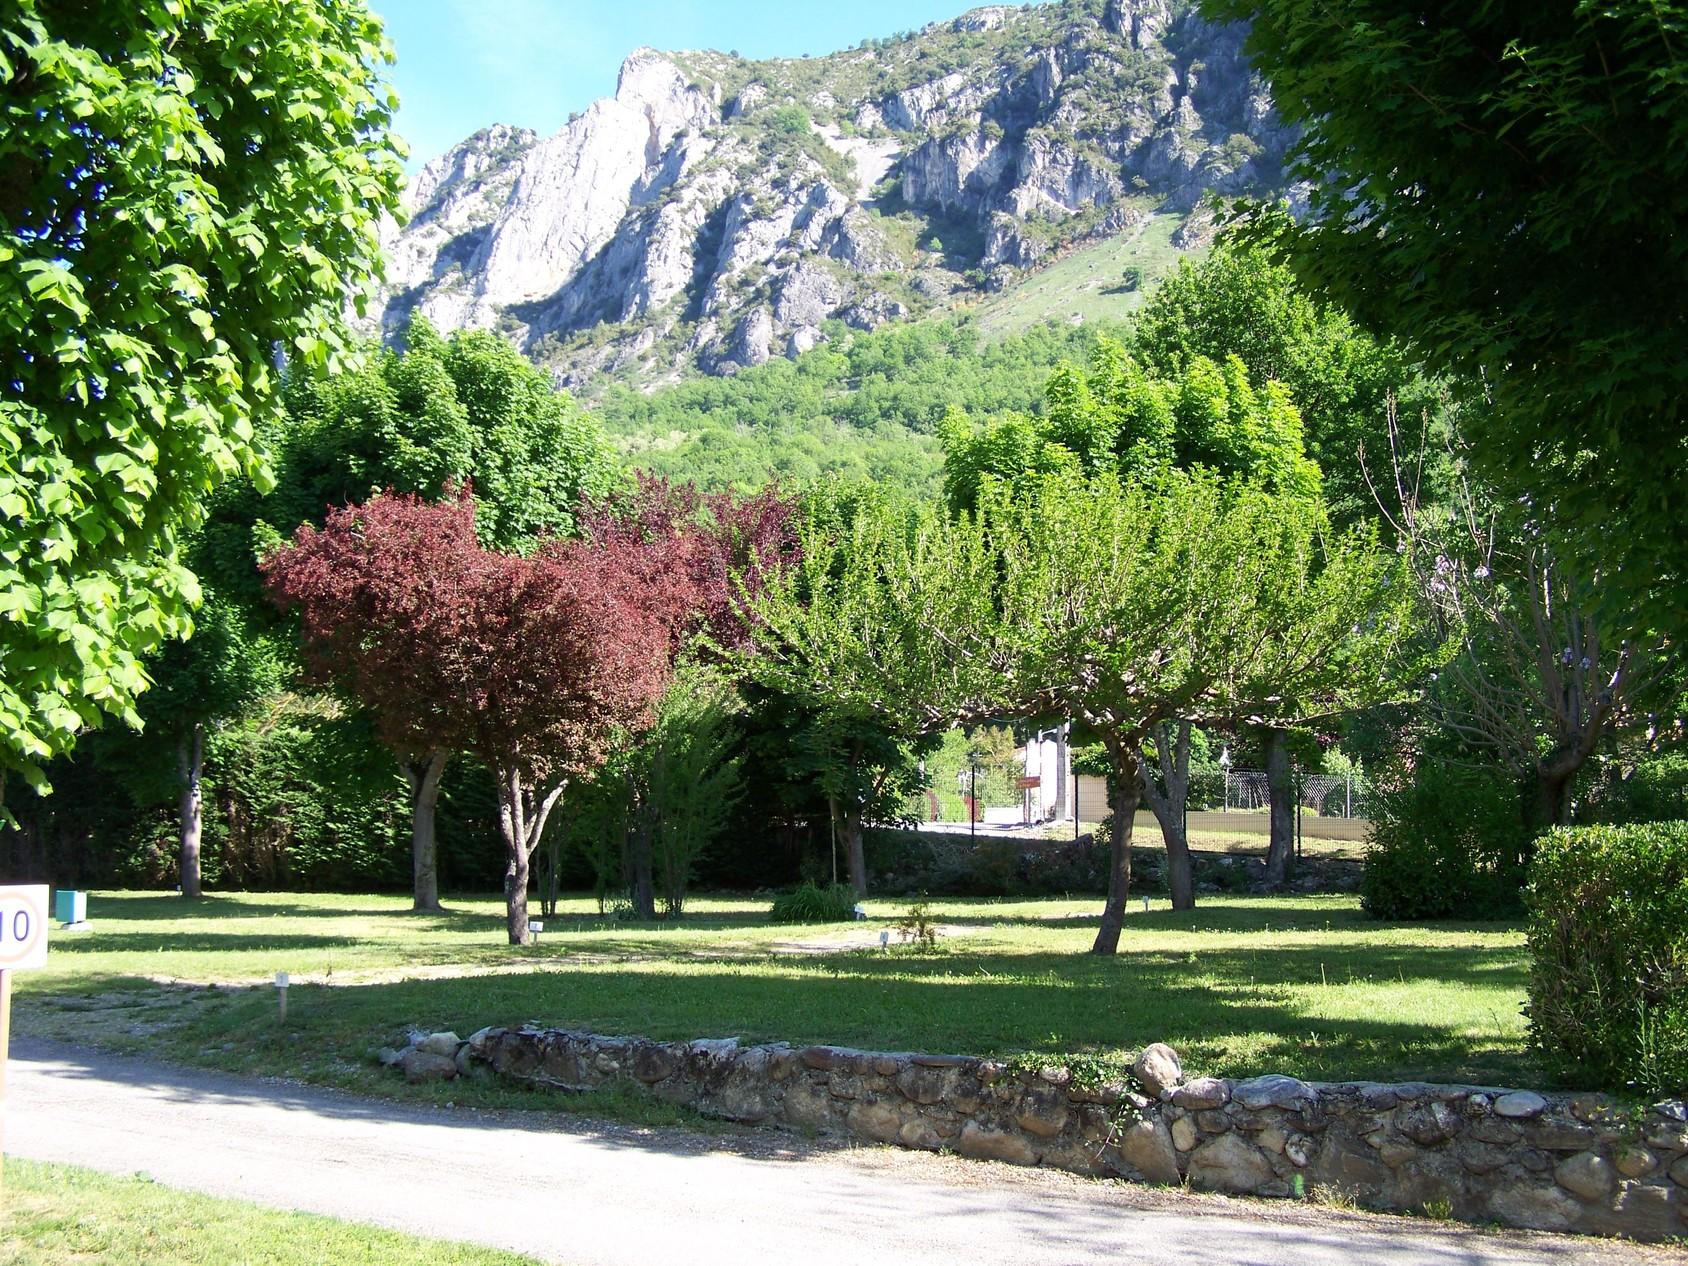 Frankrijk-TarasconsurAriege-Camping%20Le%20Sedour-ExtraLarge Wintersport Frankrijk|Pagina 2 van 55